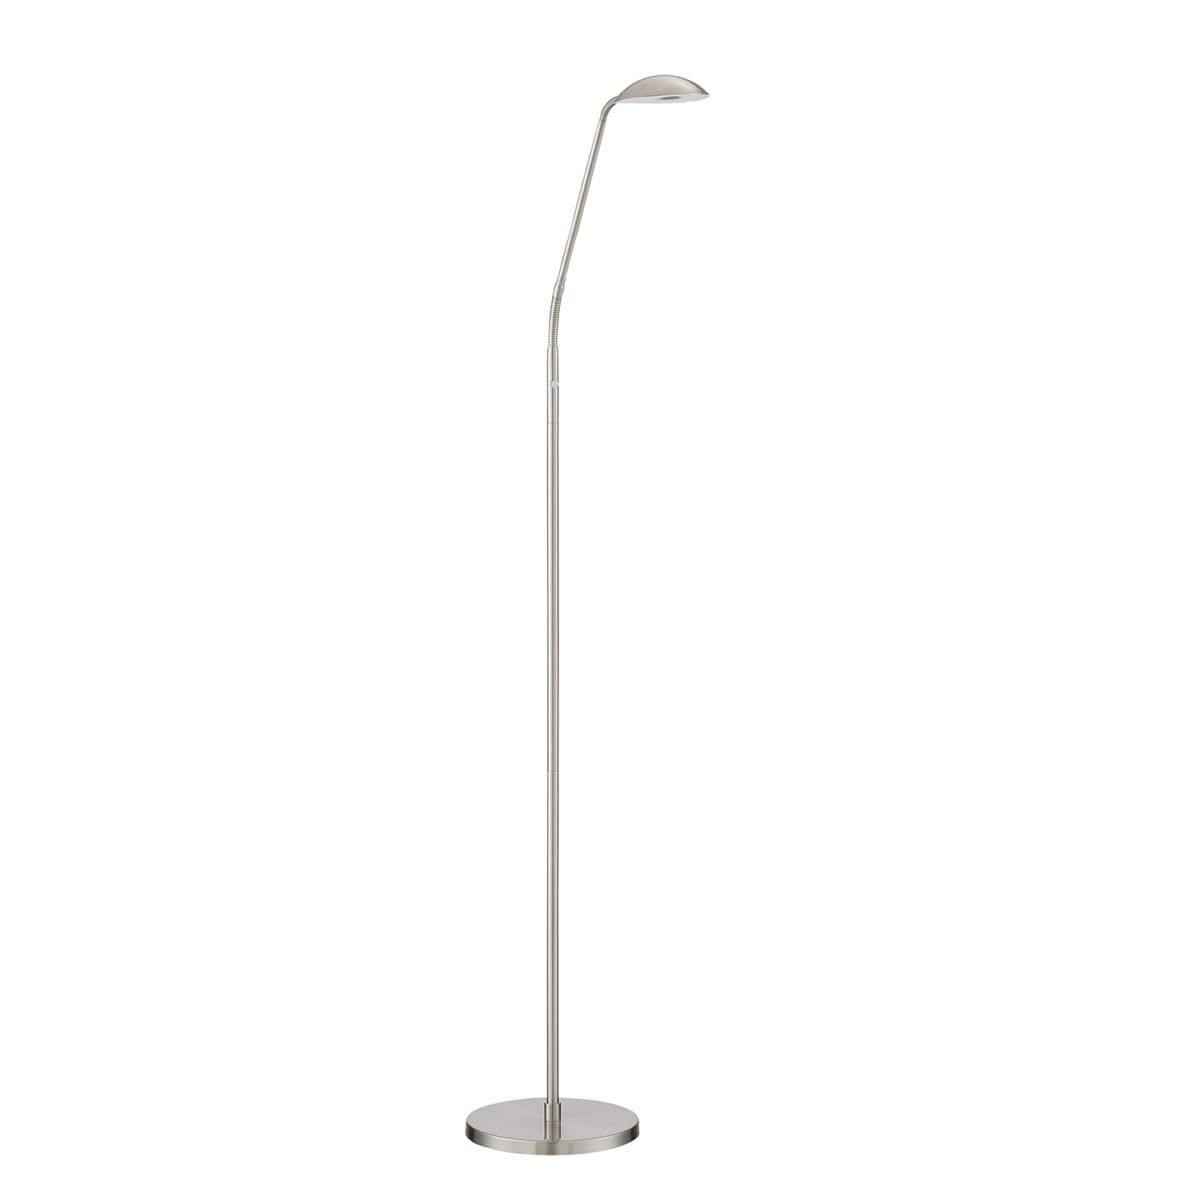 148 FL4095 SN LED Floor Lamp Regular Price $149.99 Sale Price $104.99